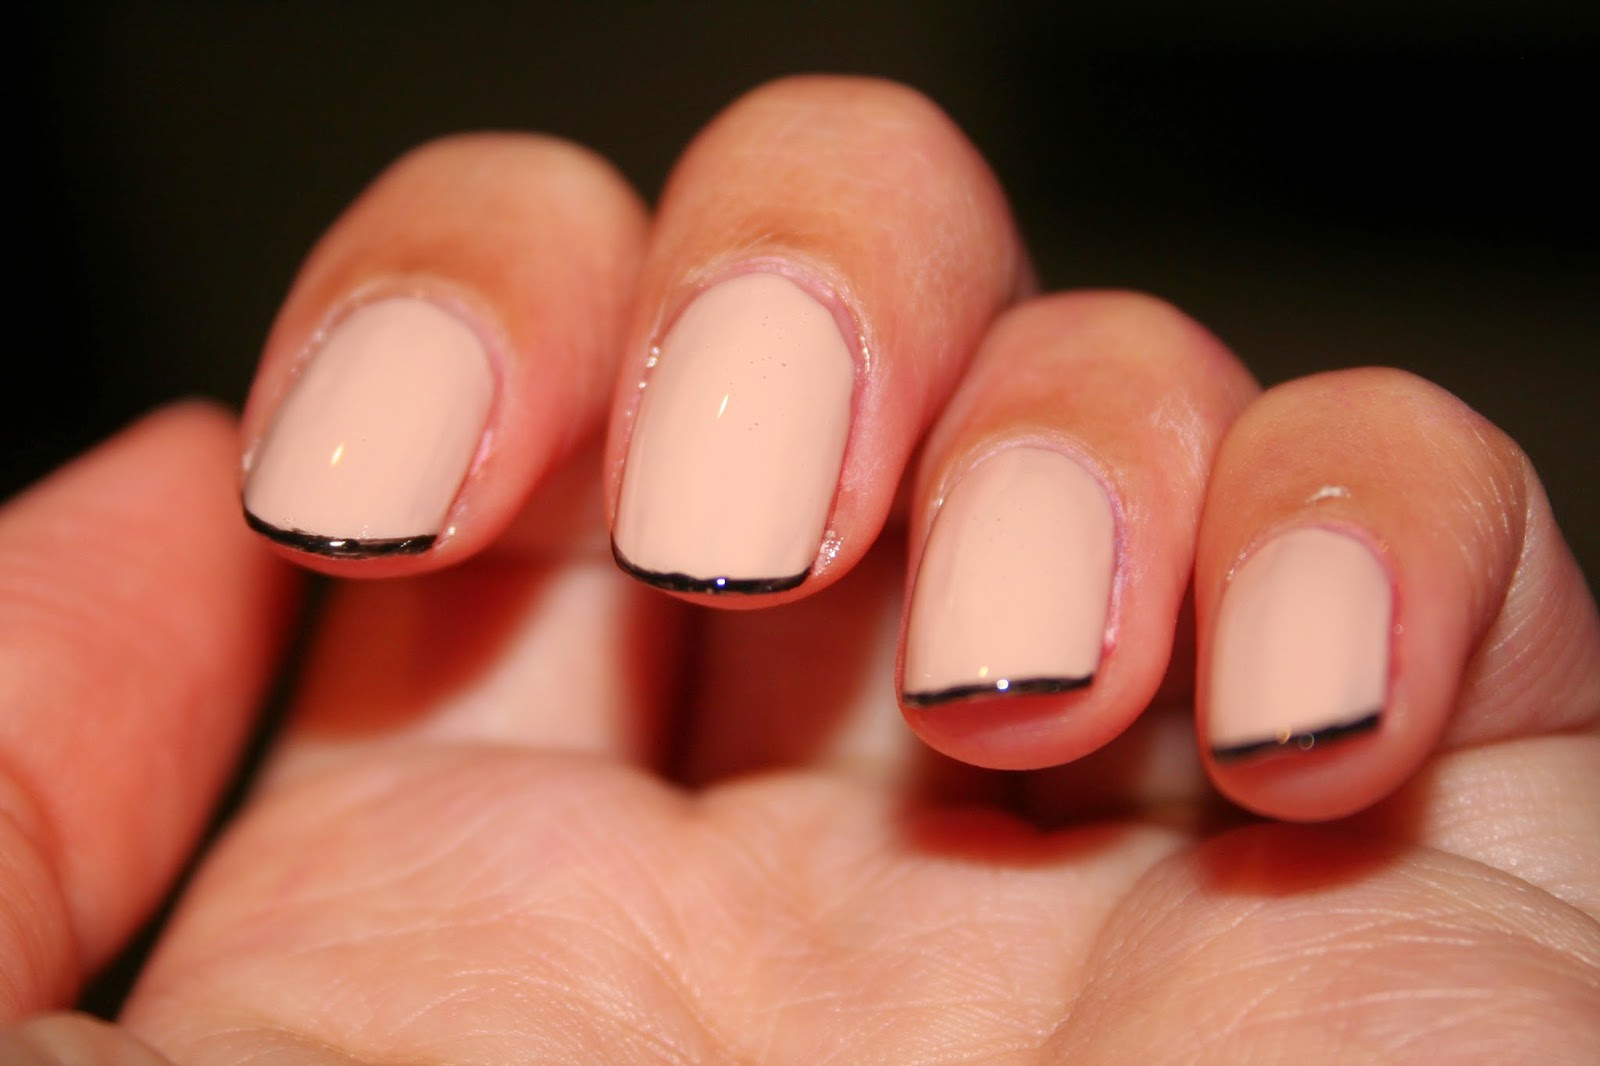 Popolare Beauty Live: #BloggerLab: Nail Art per Laurea! BQ35